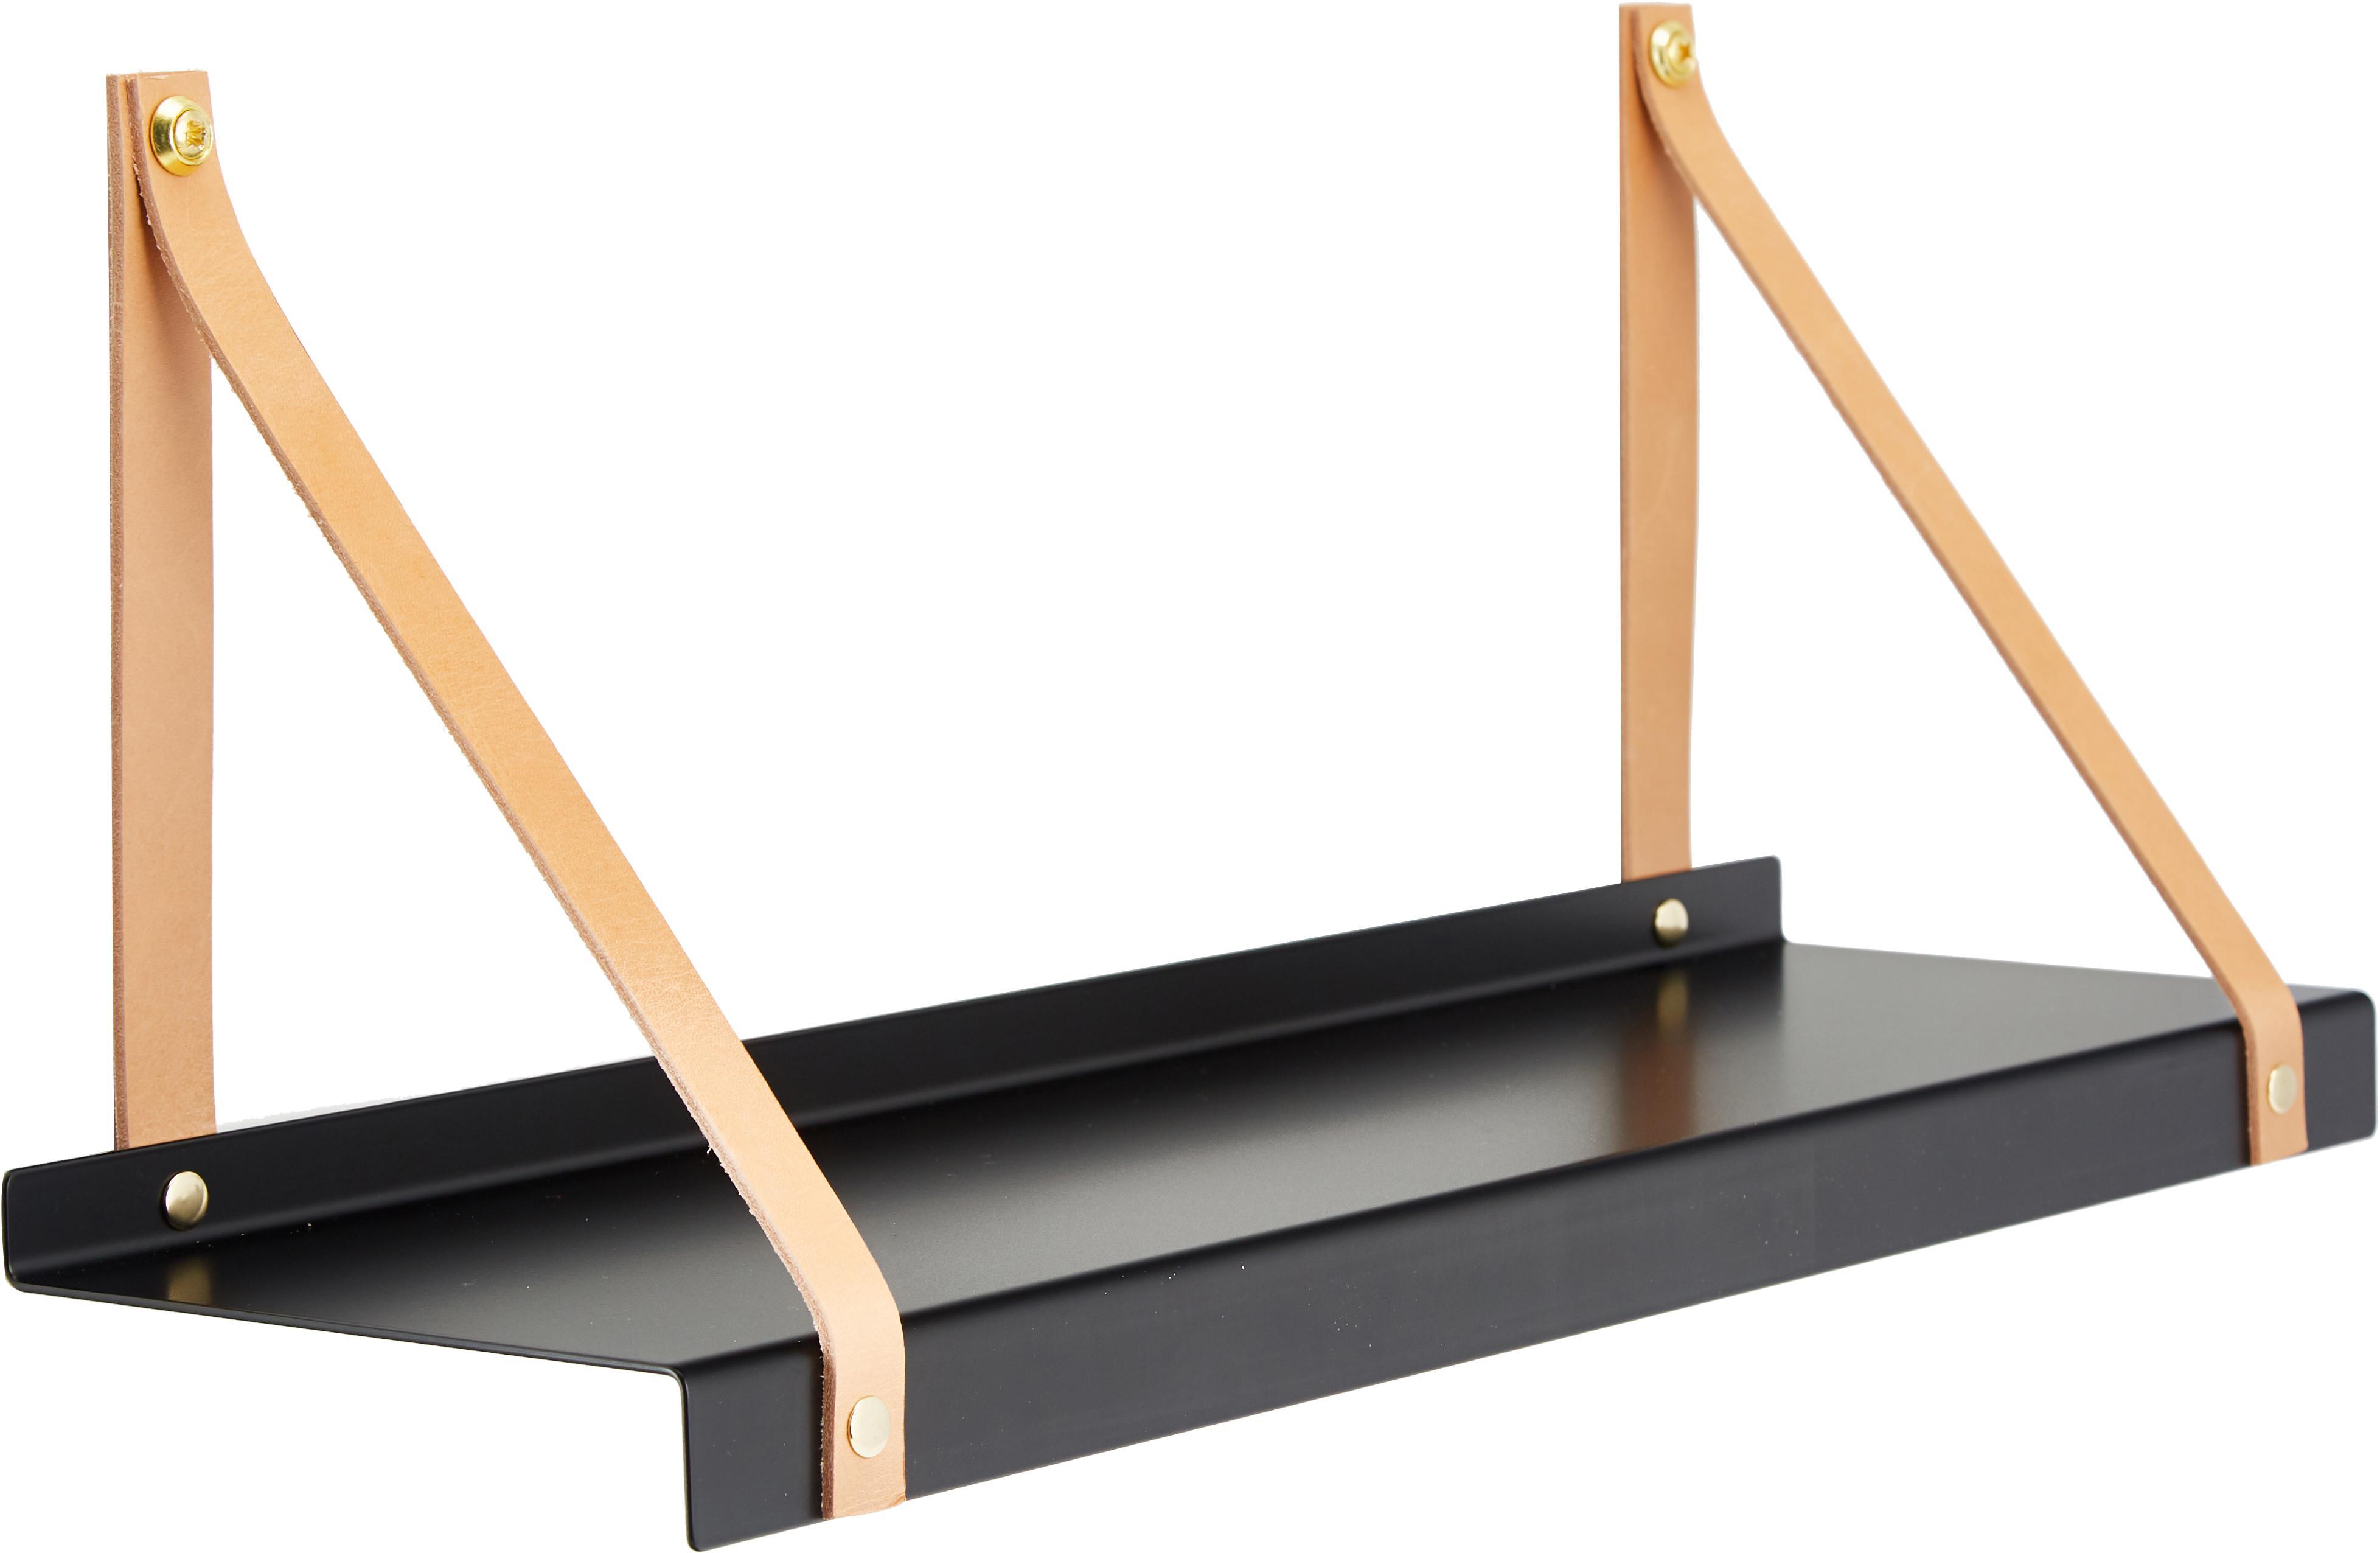 Metall-Wandregal Shelfie mit Lederriemen, Regalbrett: Metall, pulverbeschichtet, Riemen: Leder, Schwarz, Braun, 50 x 23 cm